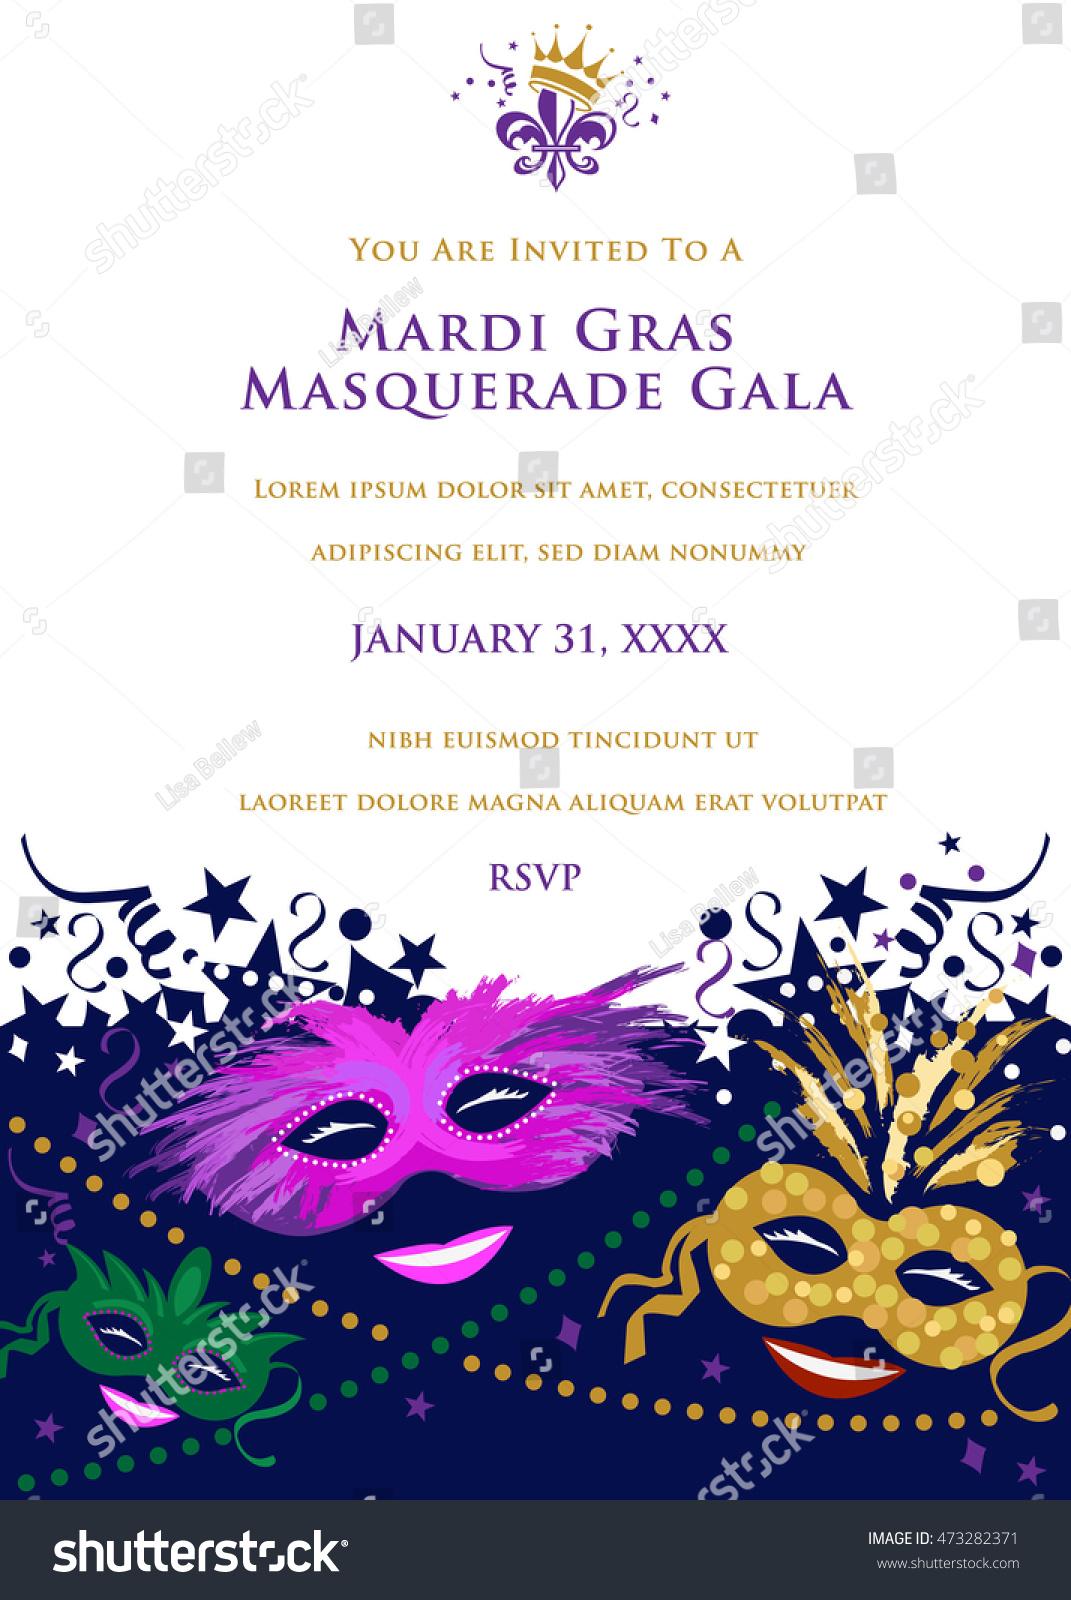 Mardi Gras Masquerade Party Invitation Stock Vector 473282371 ...